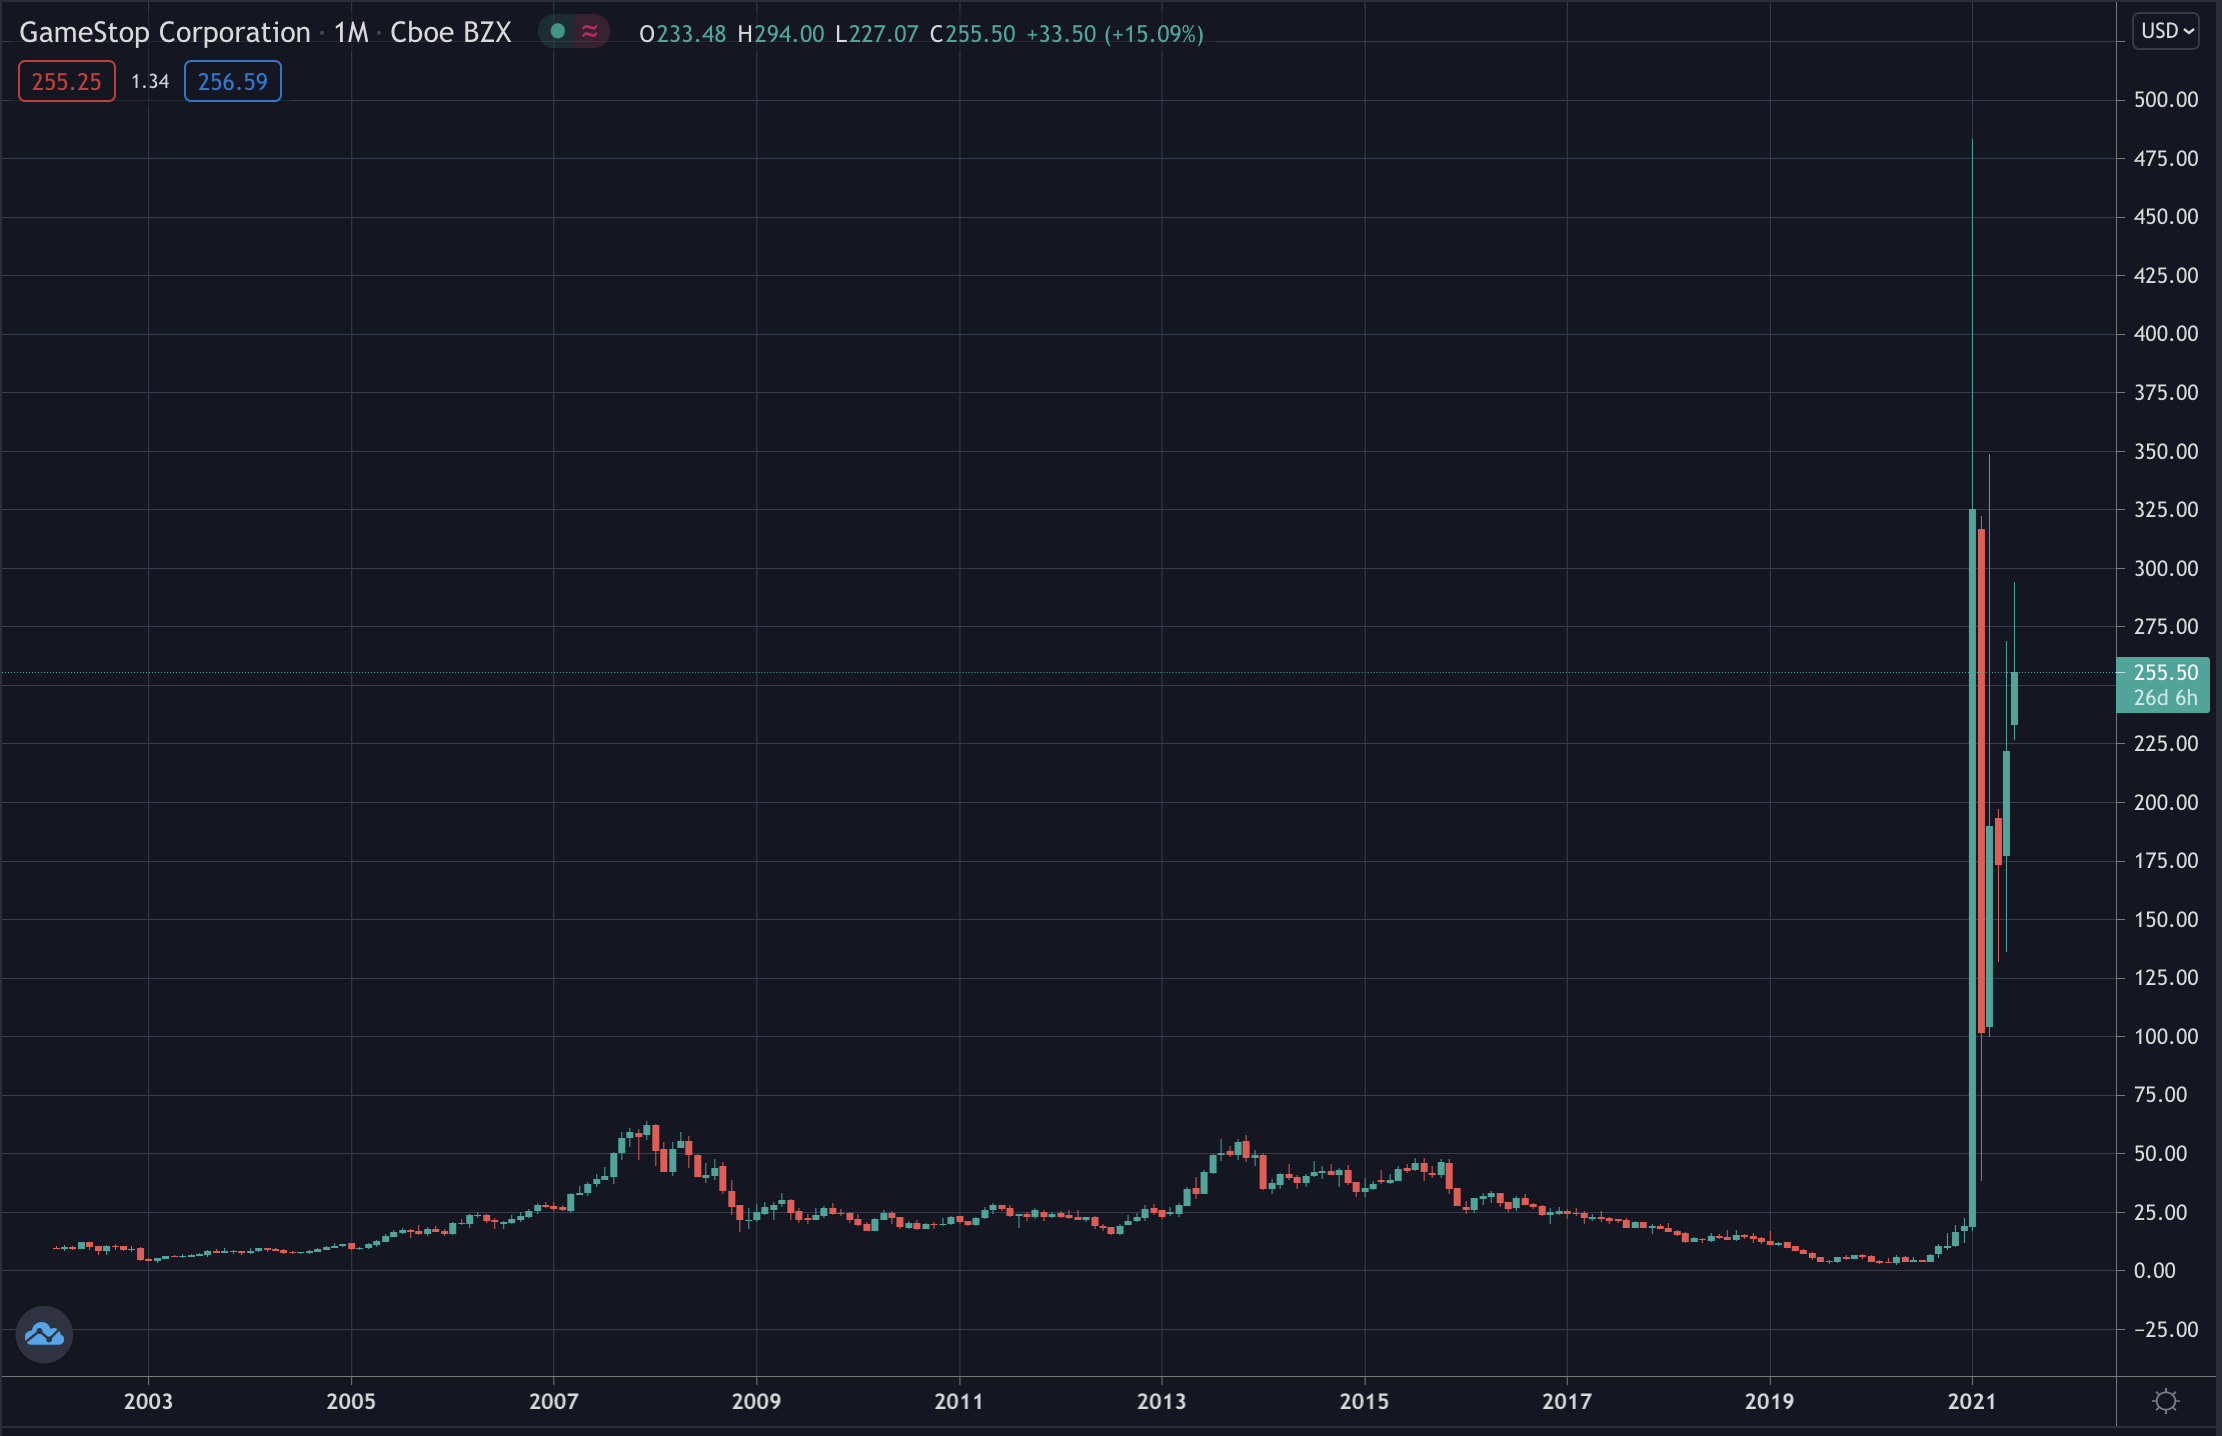 GME stock, June 2021